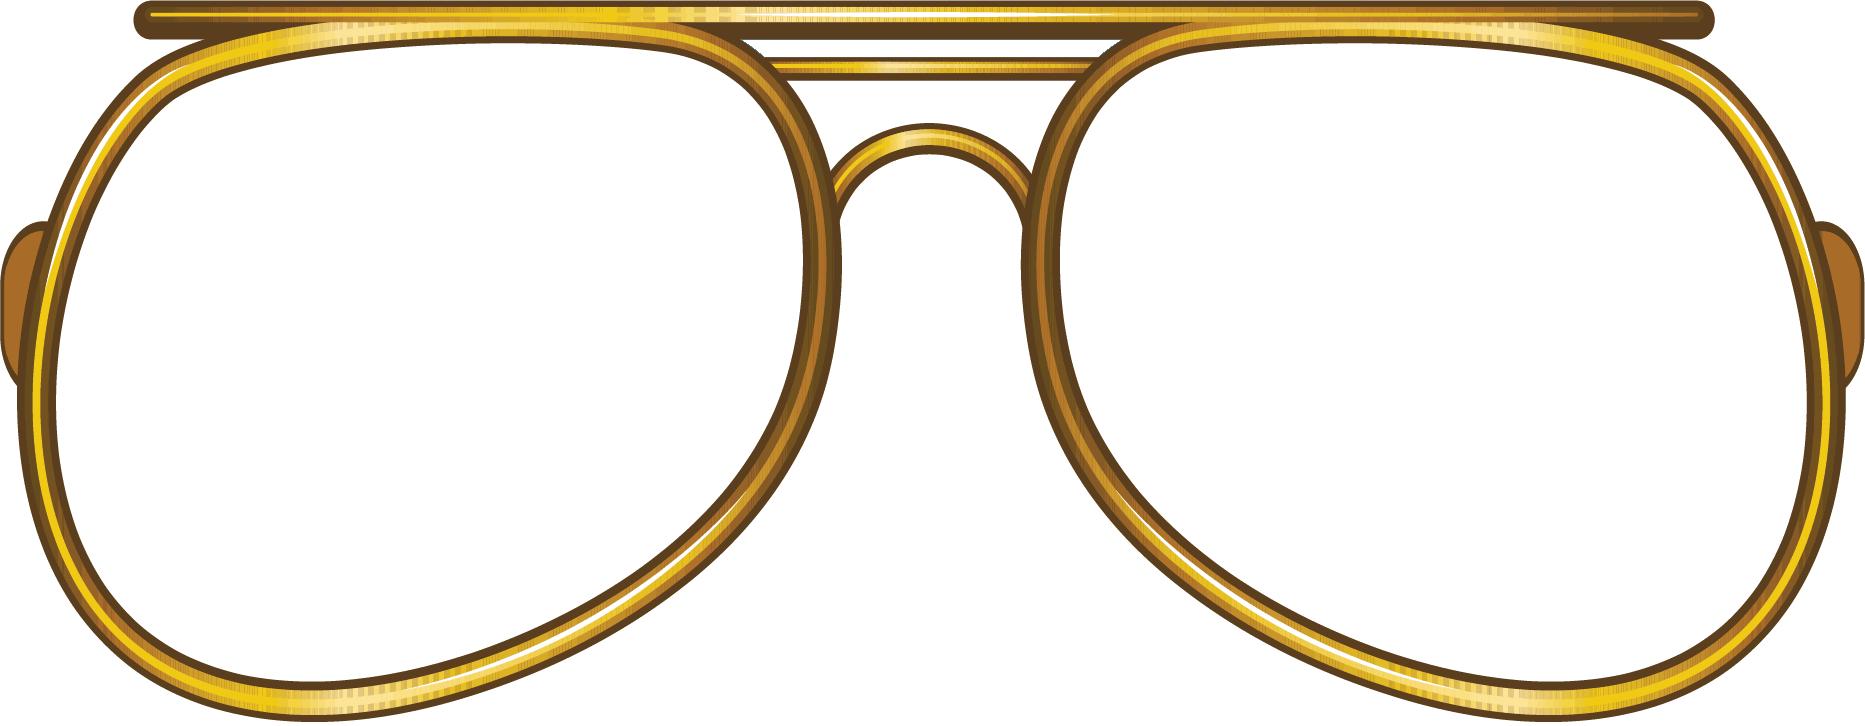 Nerd glasses sunglasses clip art free clipart images